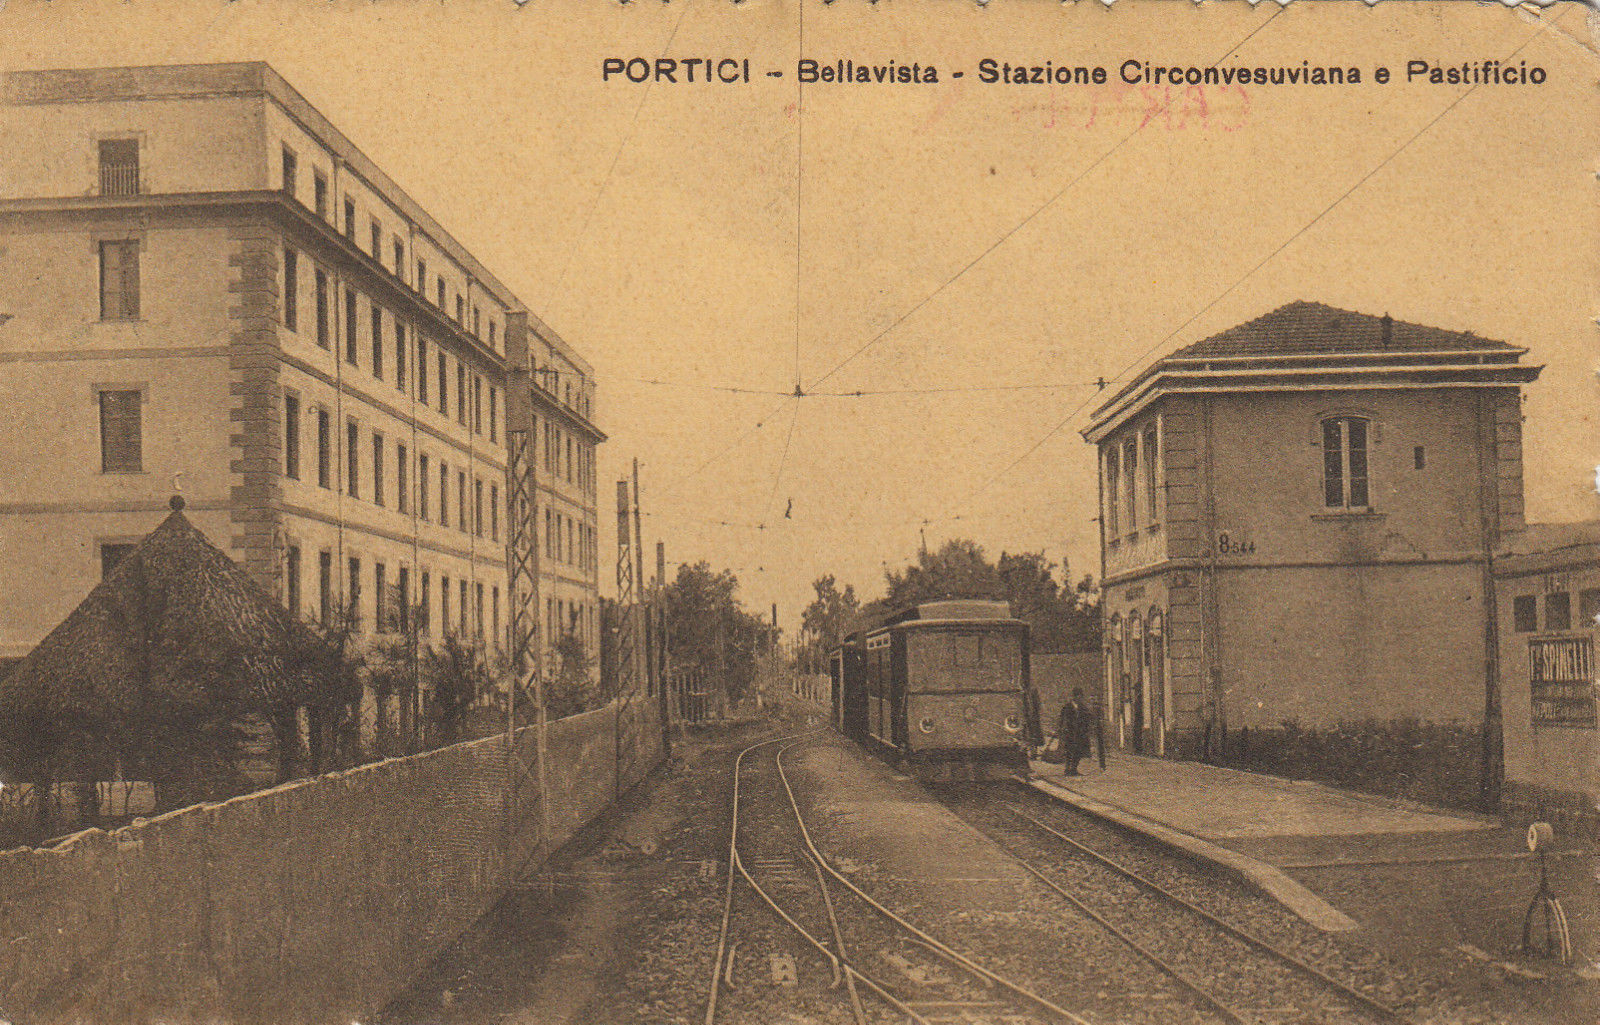 portici-bellavista pastificio treno sfsm circumvesuviana